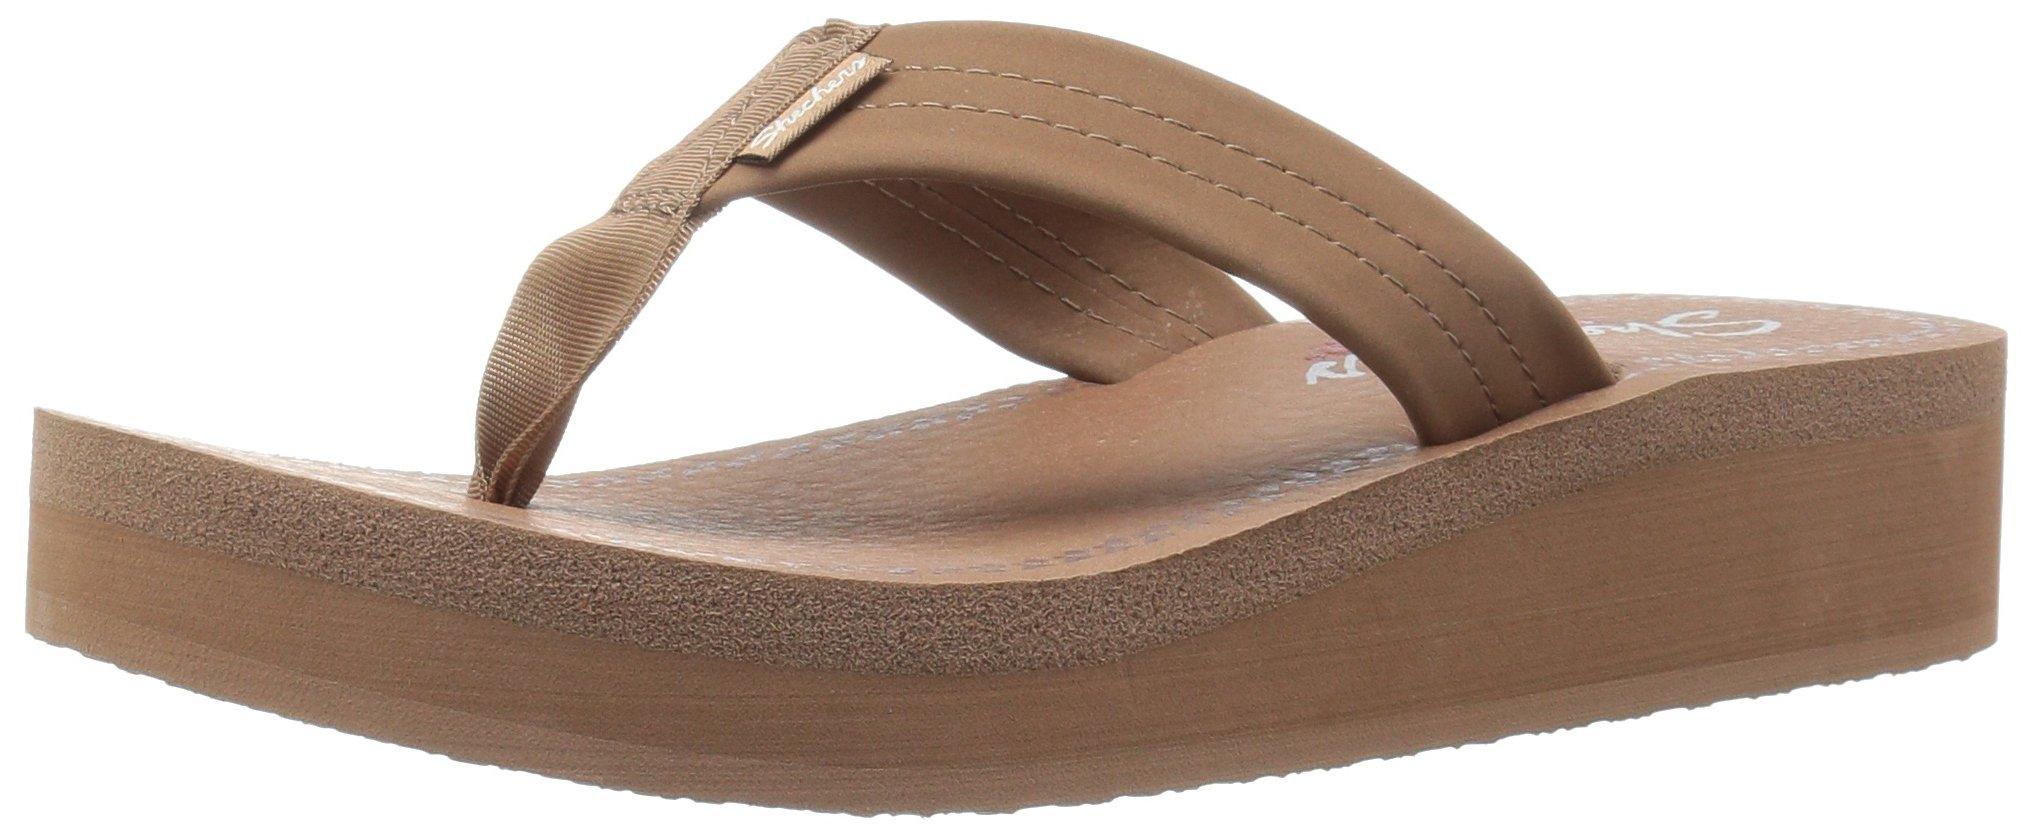 7c2f08fb399 Galleon - Skechers Cali Women s Vinyasa Beach Bae Wedge Sandal